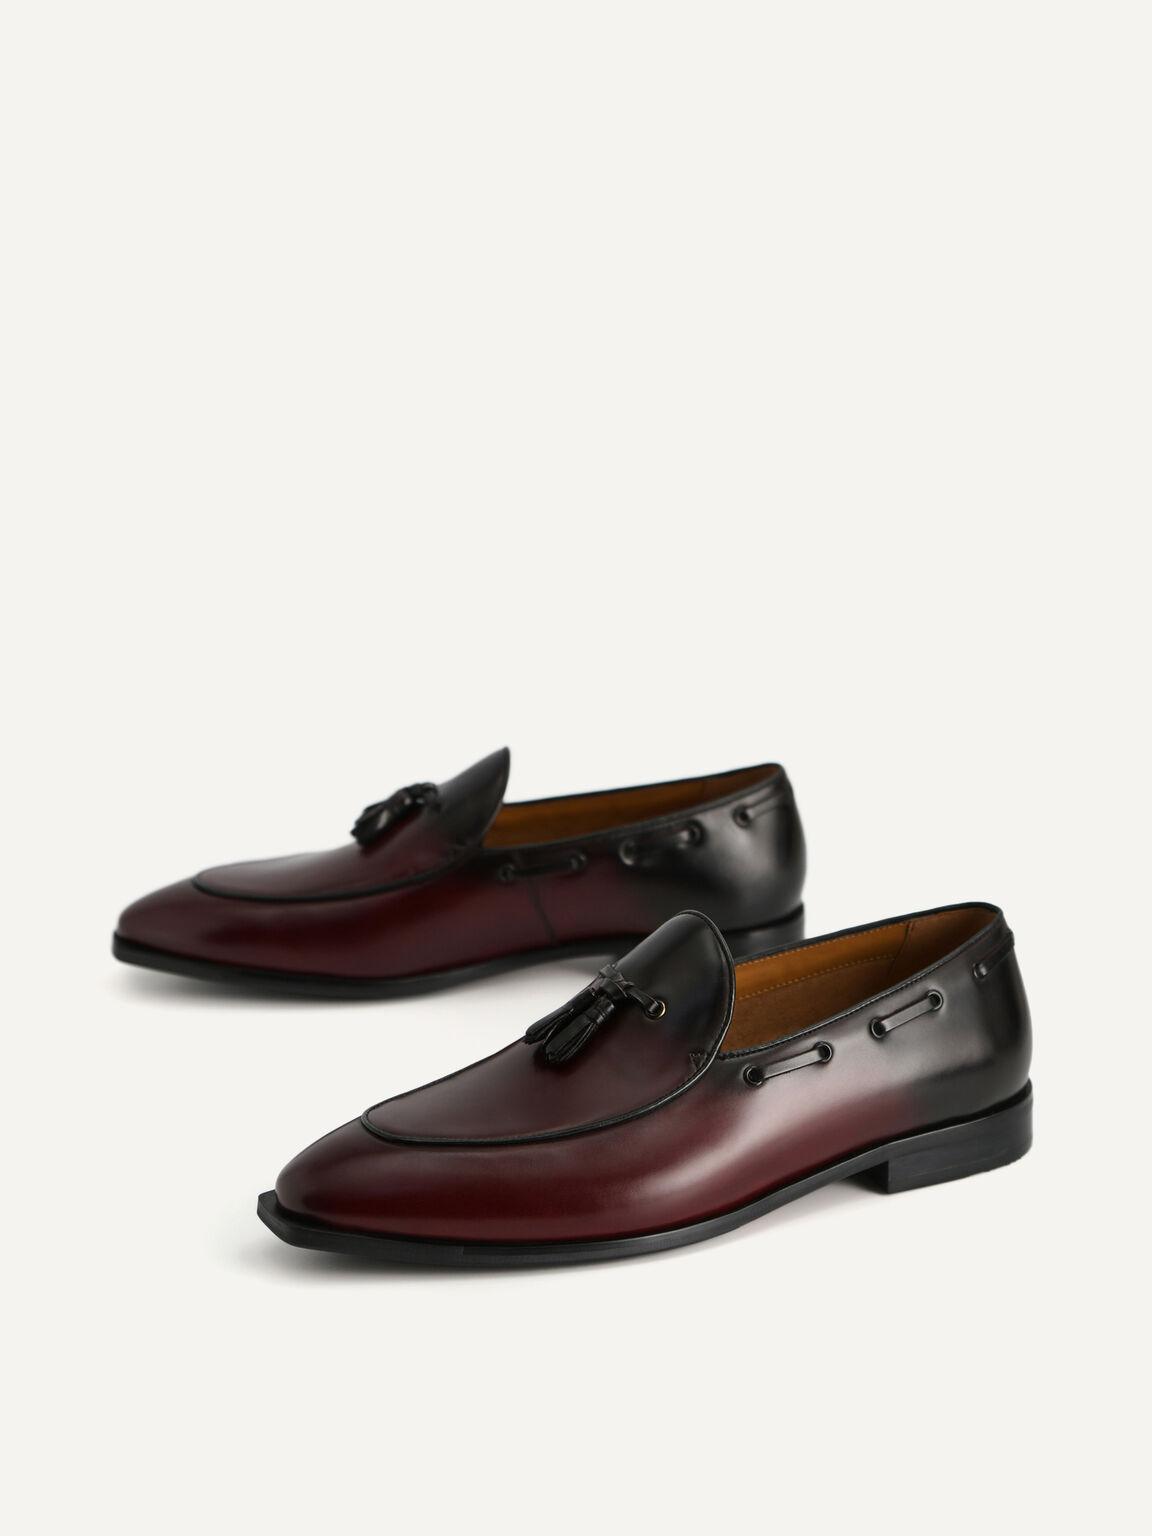 Leather Tasselled Loafers, Maroon, hi-res